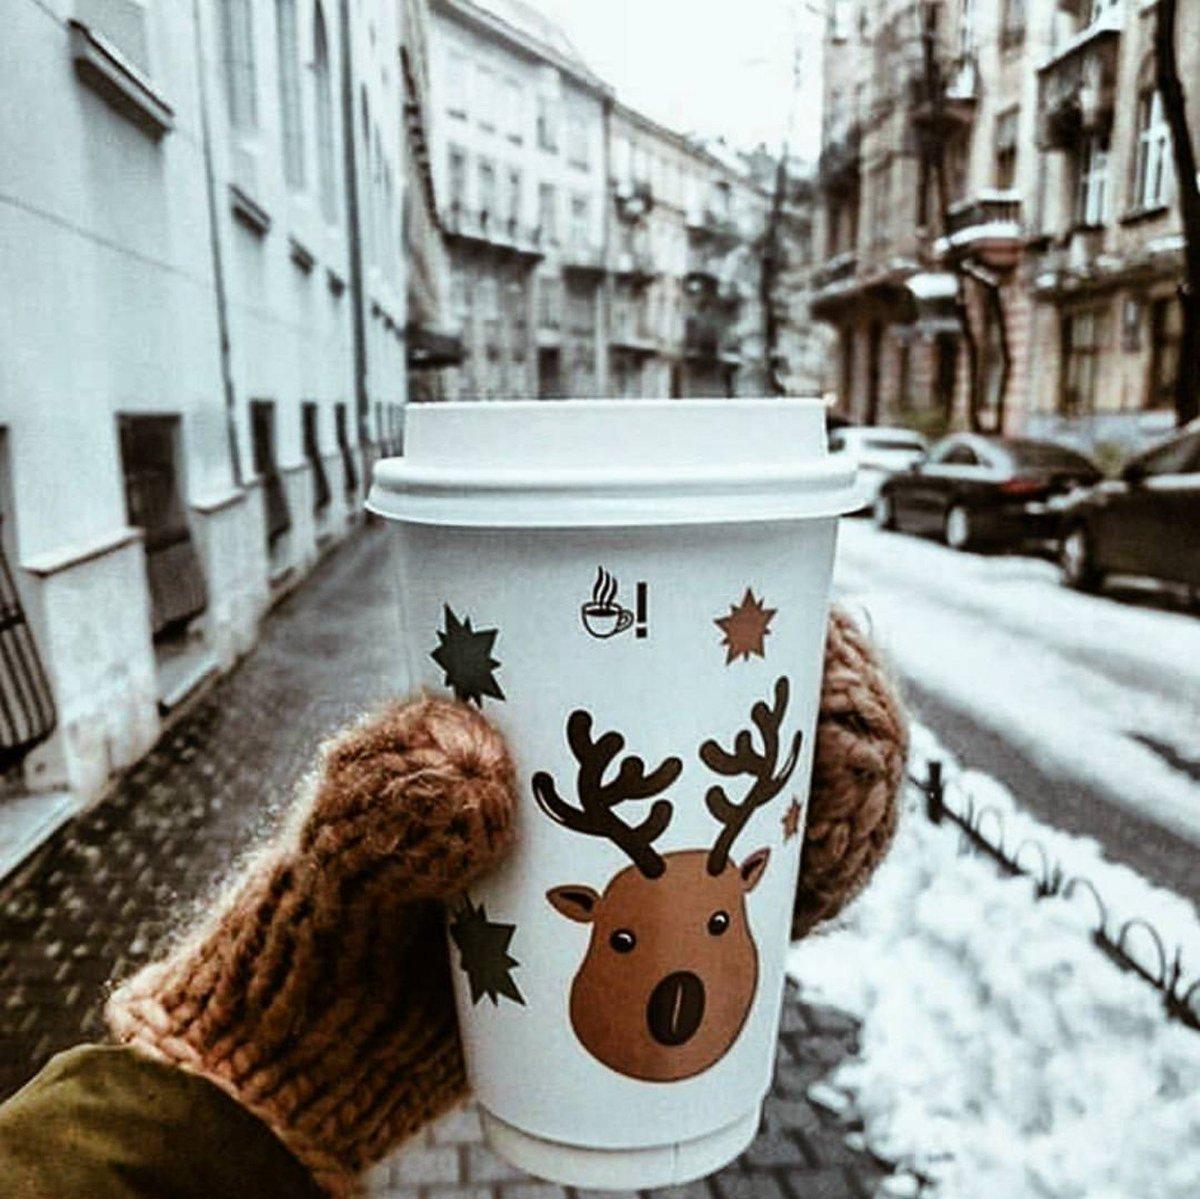 #coffeetime https://t.co/jpc2iaUtC3